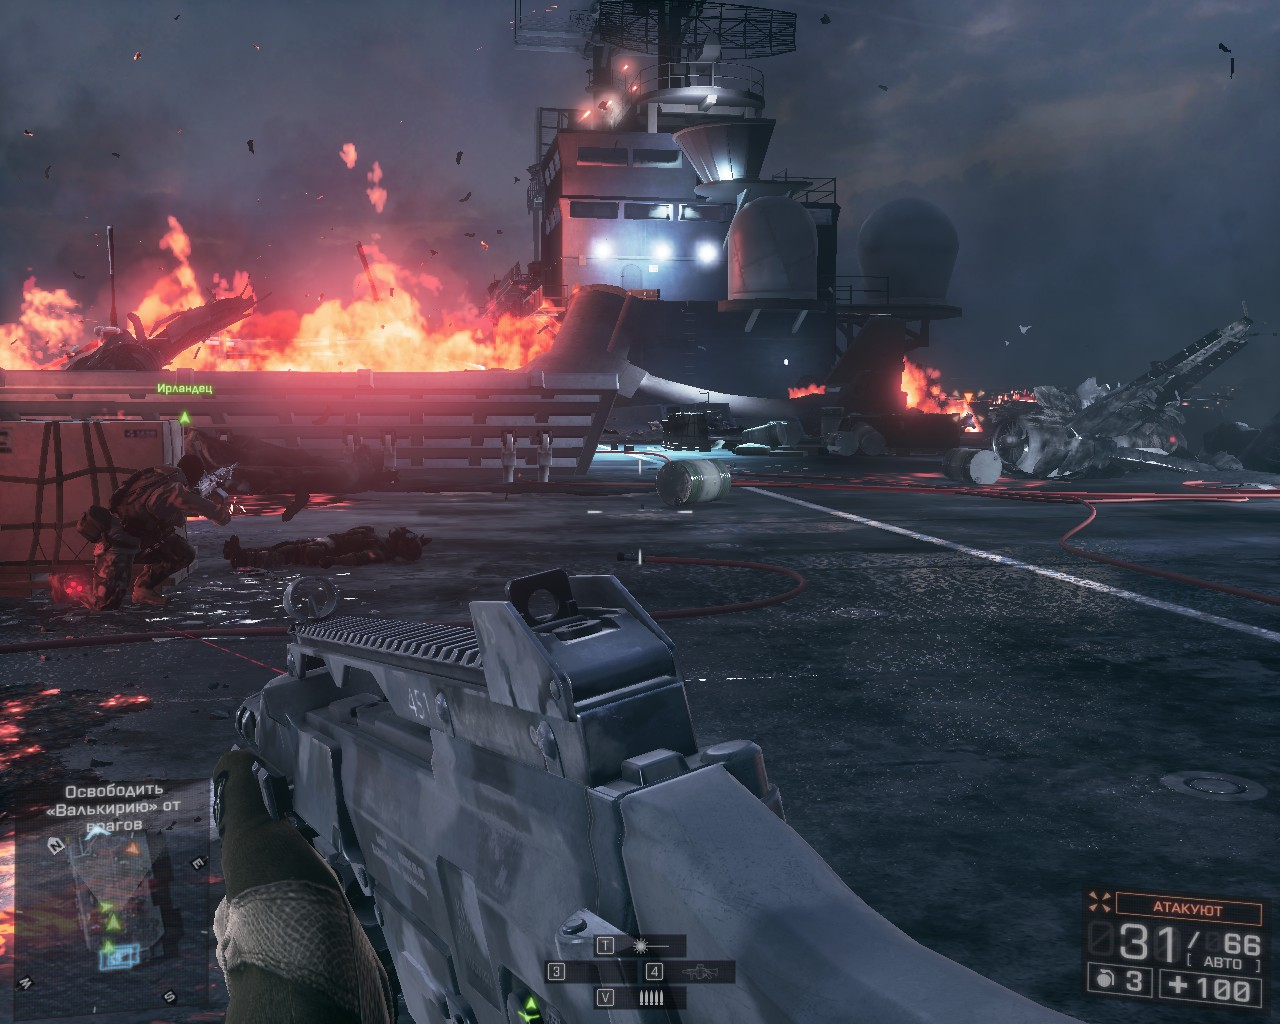 bf4 2014-04-07 00-33-34-40.jpg - Battlefield 4